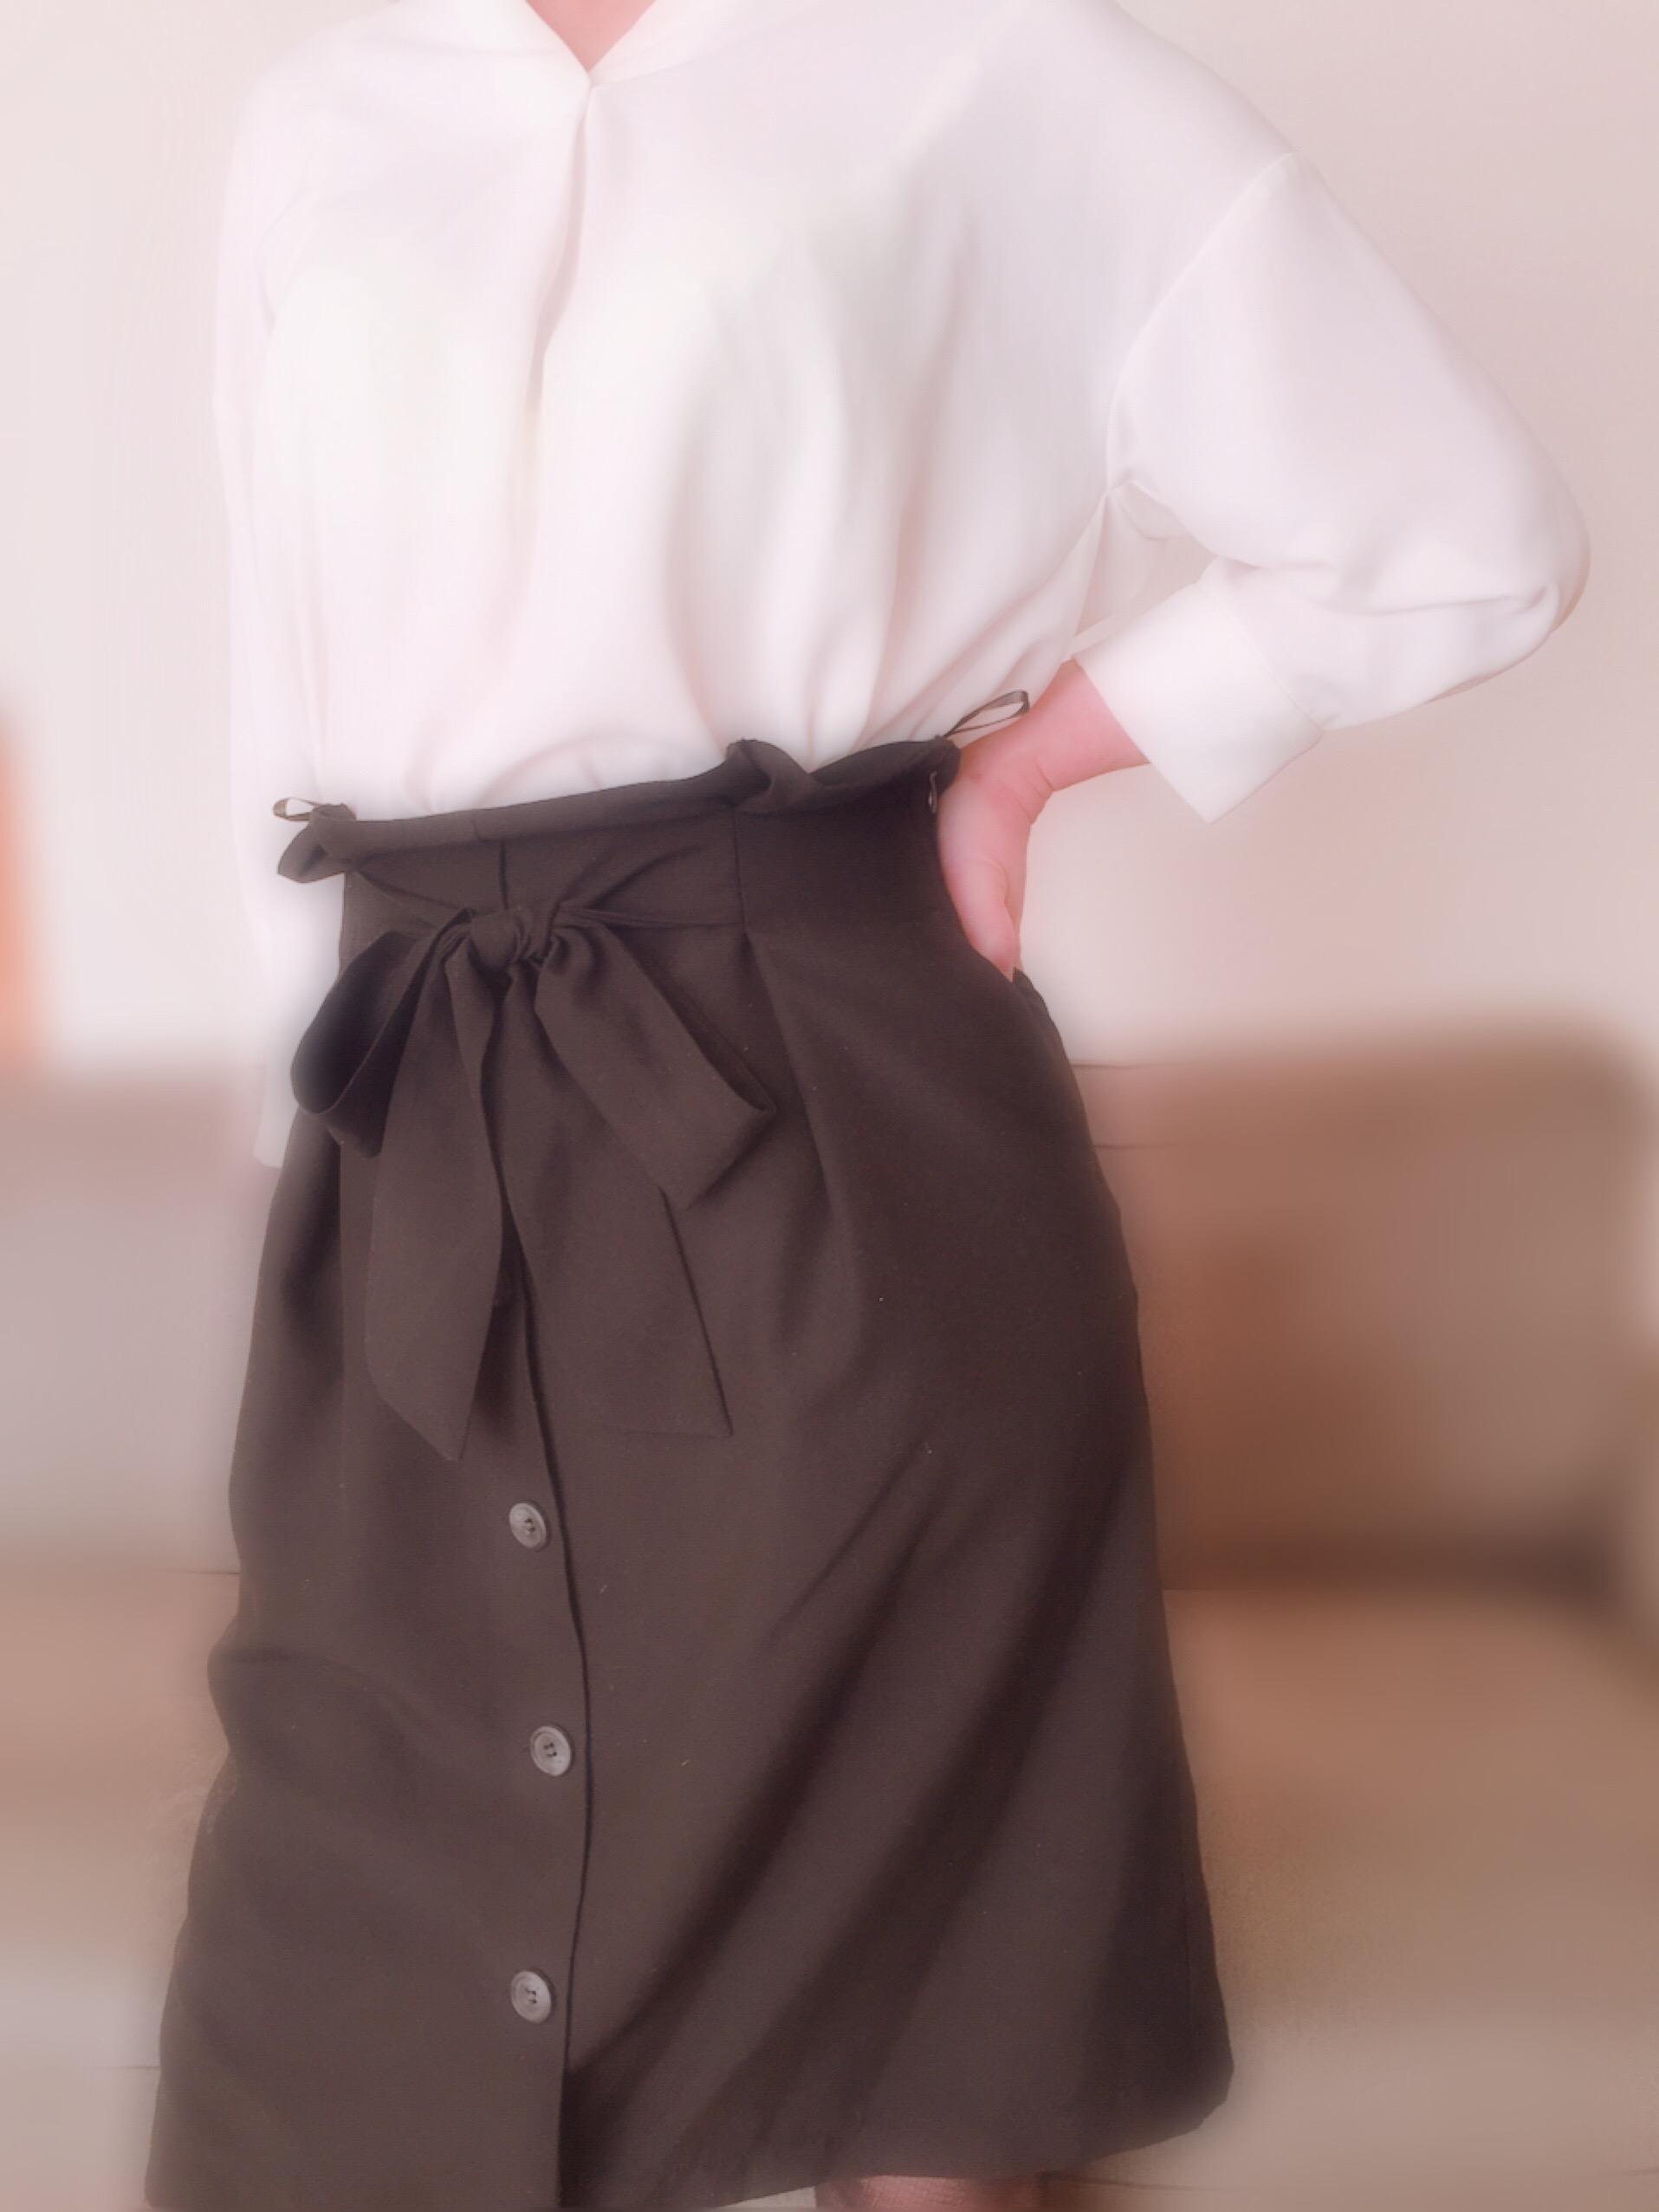 new千春(チハル)(34)